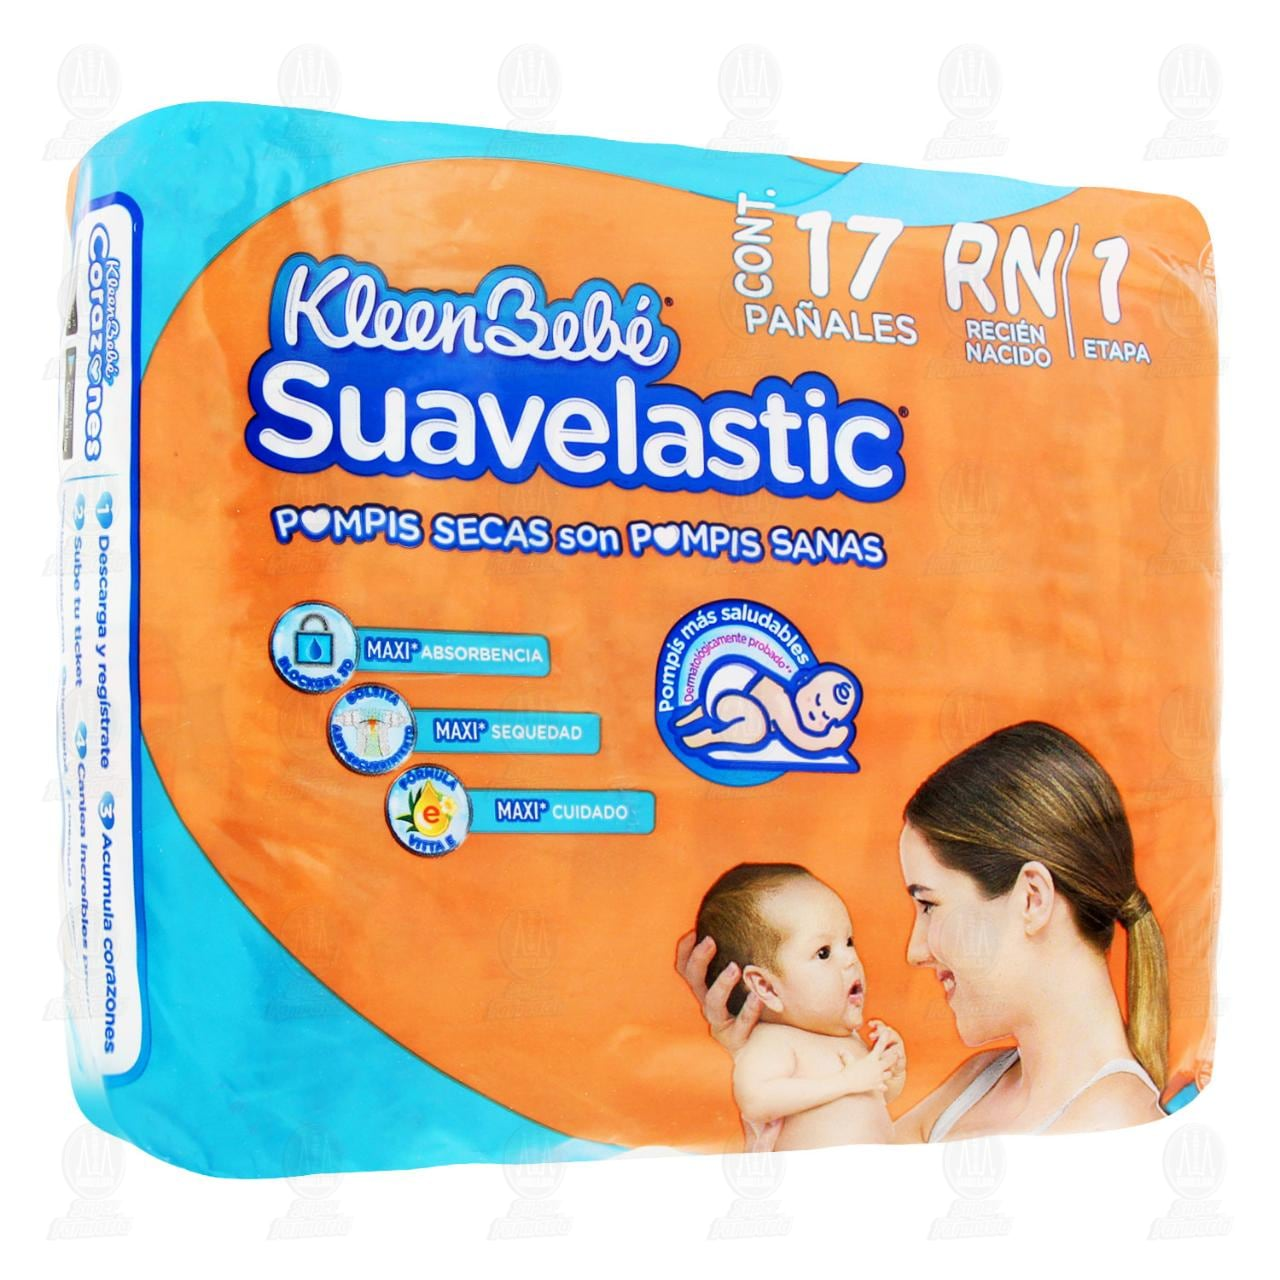 Comprar Pañales para Bebé KleenBebé Suavelastic Max Etapa 1 Talla RN, 17 pzas. en Farmacias Guadalajara